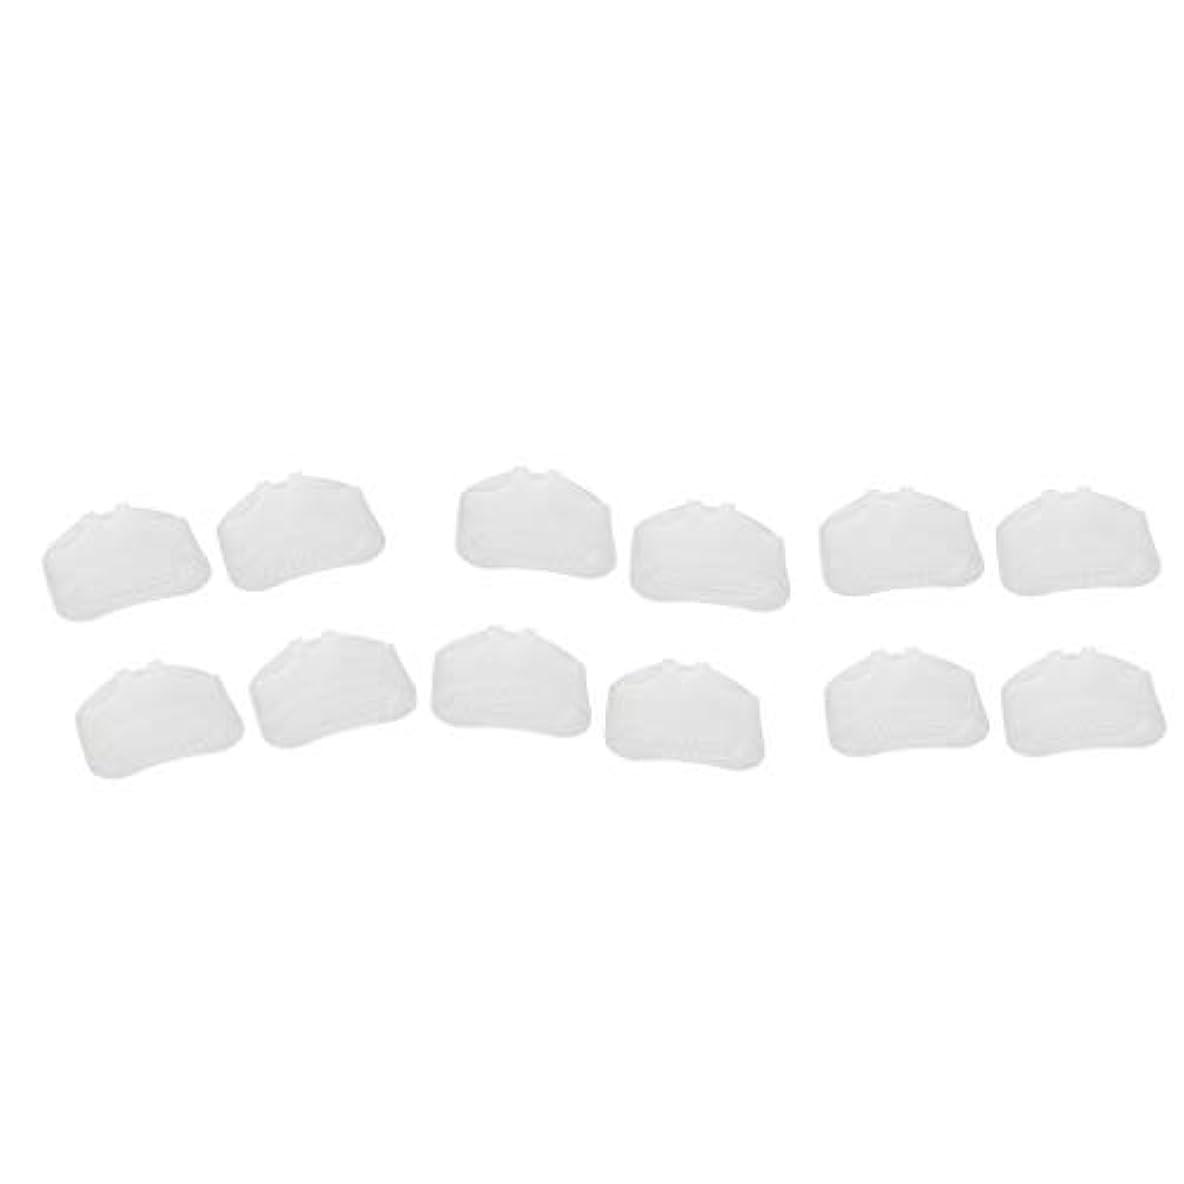 dailymall 男性と女性のための6ペアの中足骨ゲルパッドフットクッションクッションホワイト